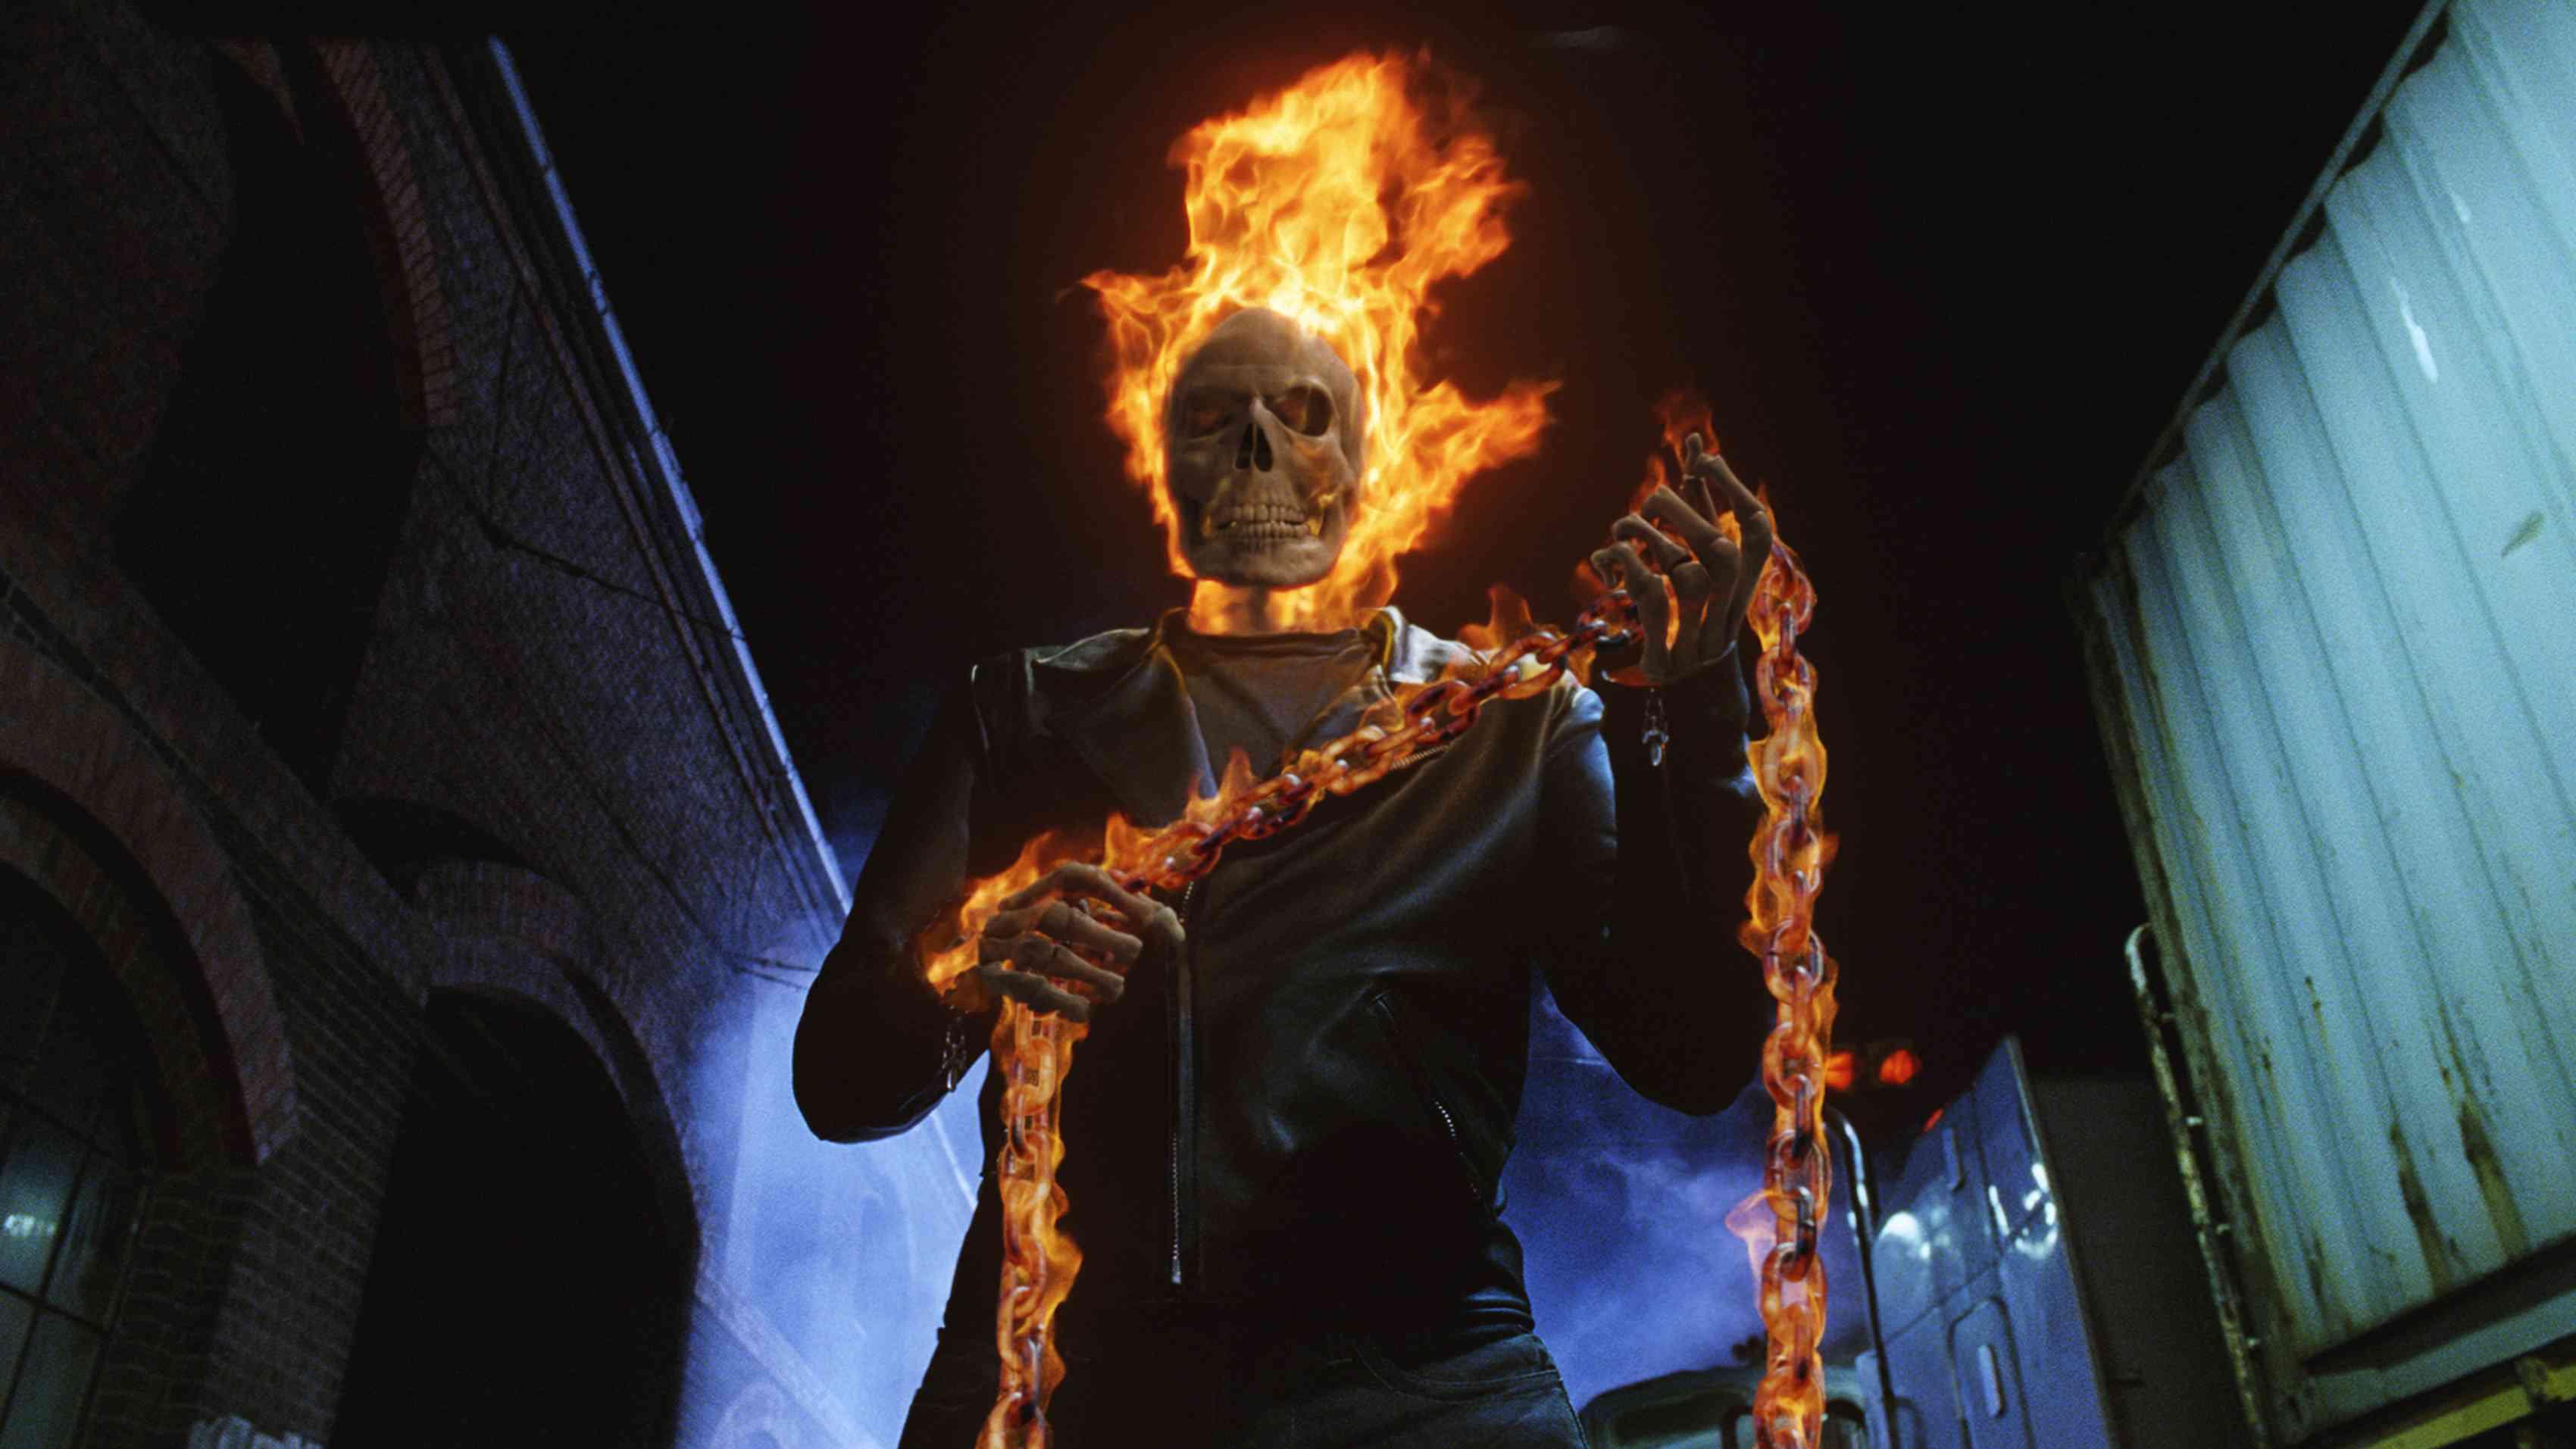 Nicolas Cage in Sony's Ghost Rider movie